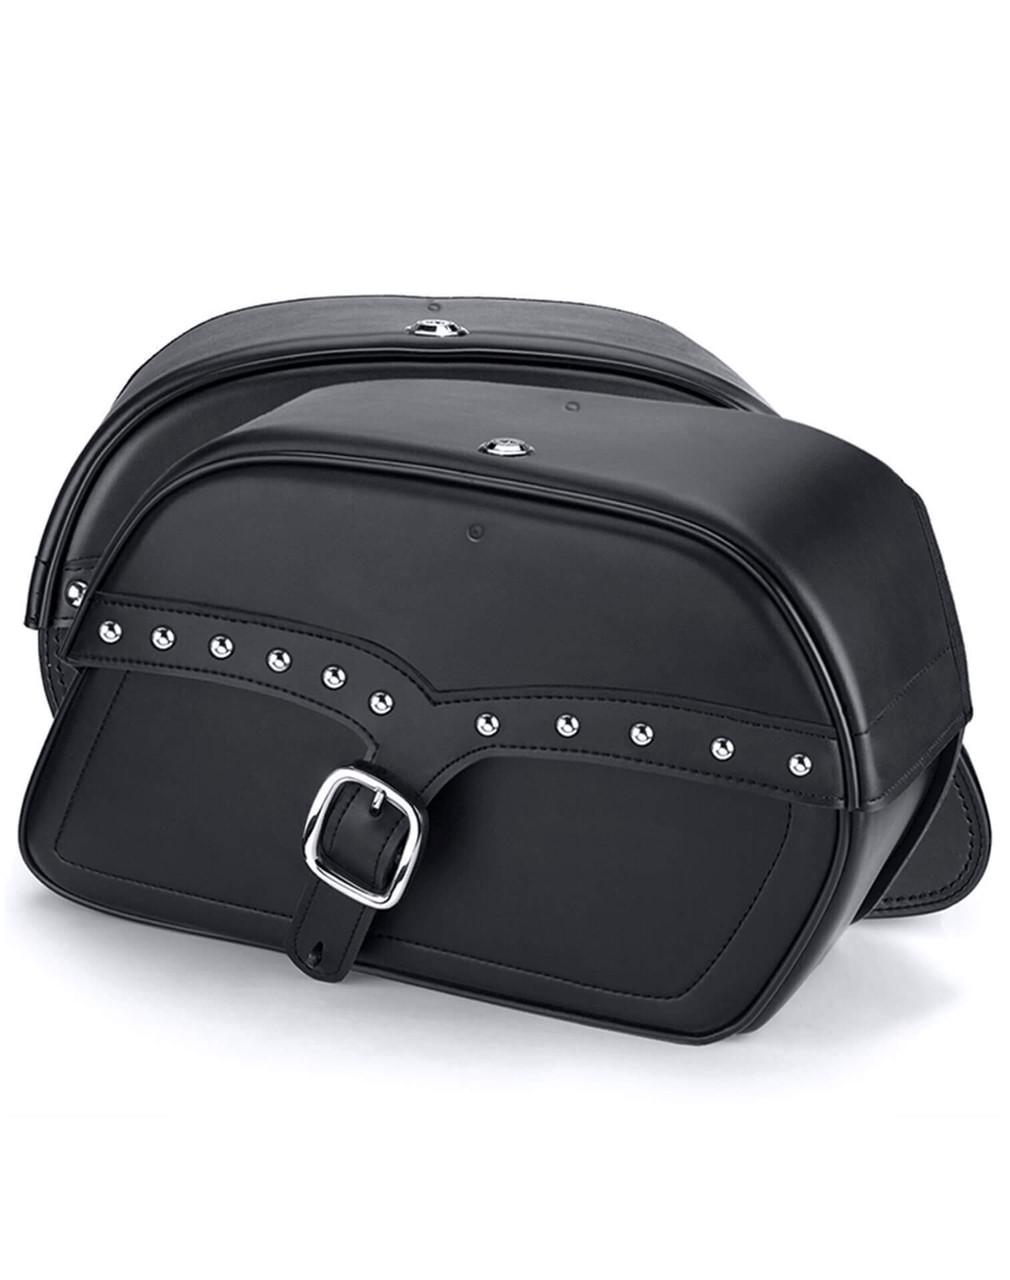 Kawasaki 1600 Mean Streak Charger Single Strap Studded Medium Motorcycle Saddlebags Both Bags View